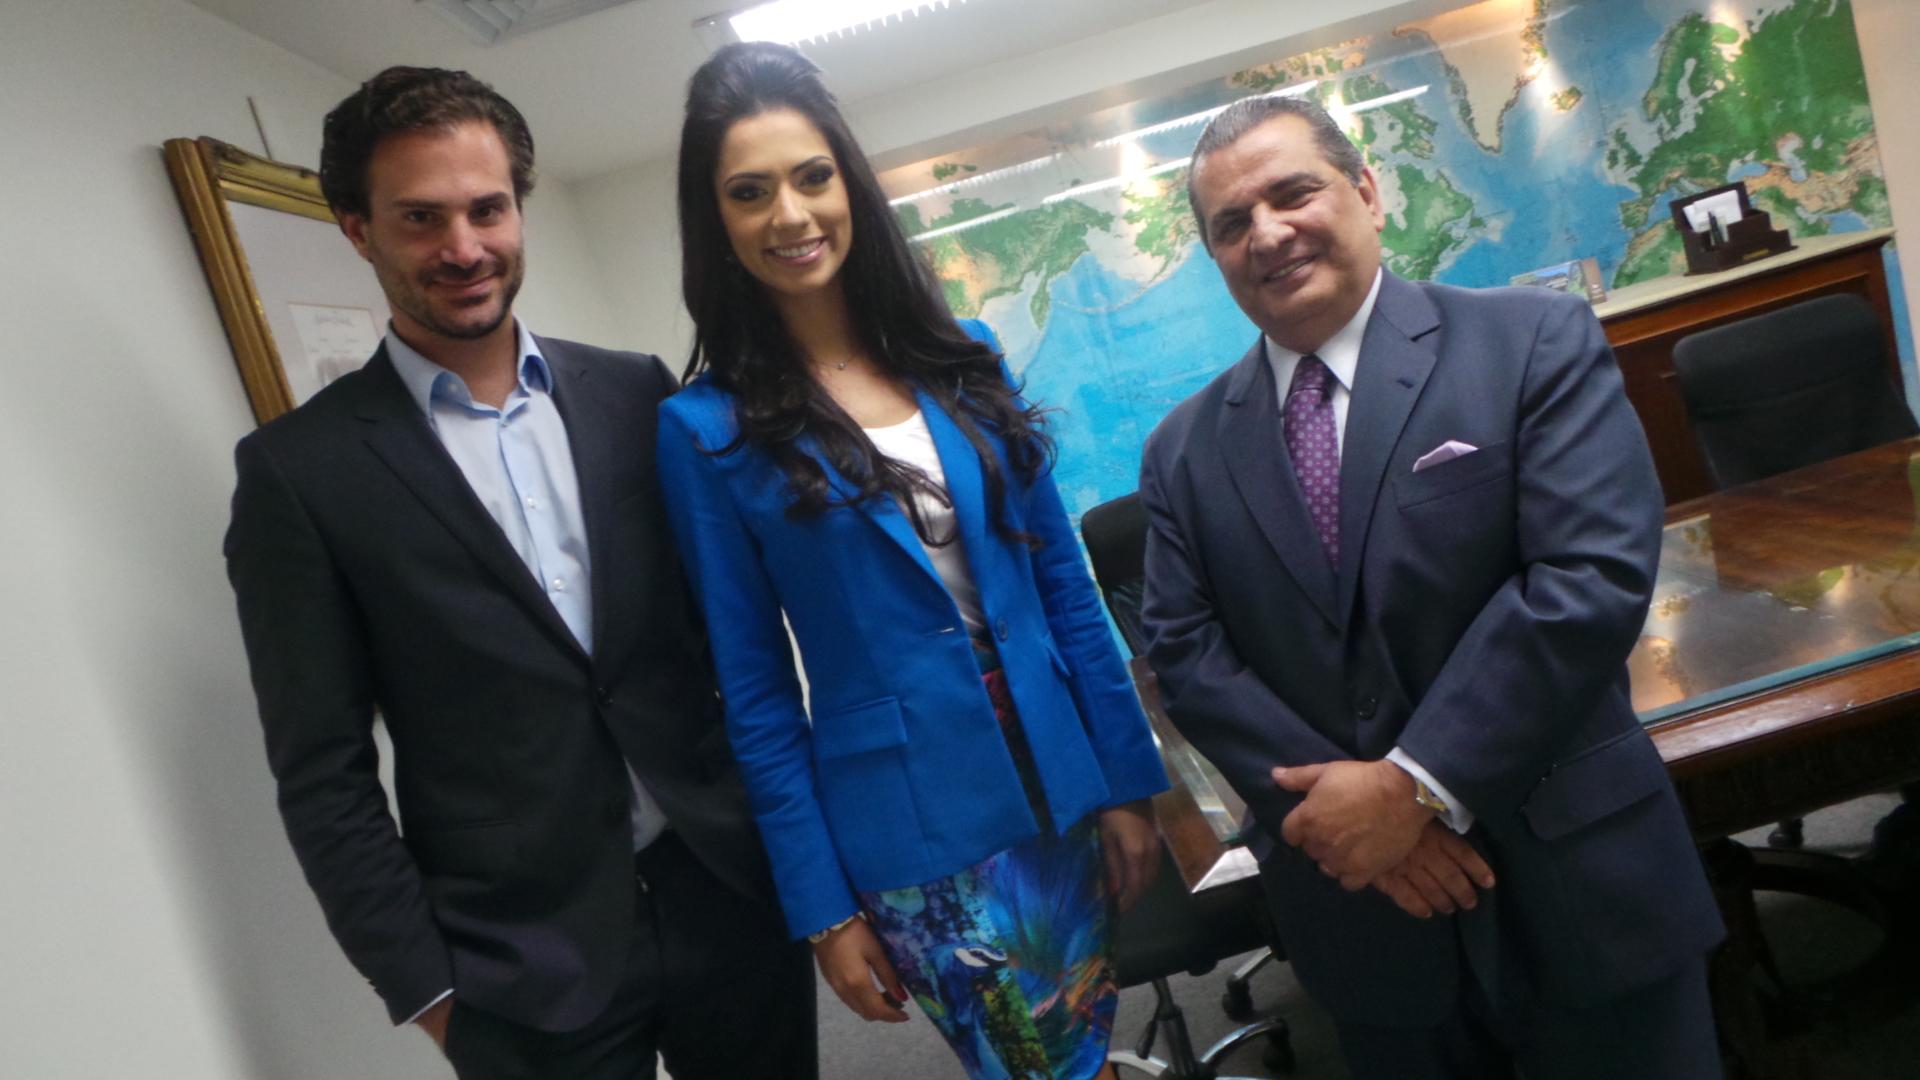 janaina barcelos, miss brasil motors internacional 2010. - Página 4 Cly529kr